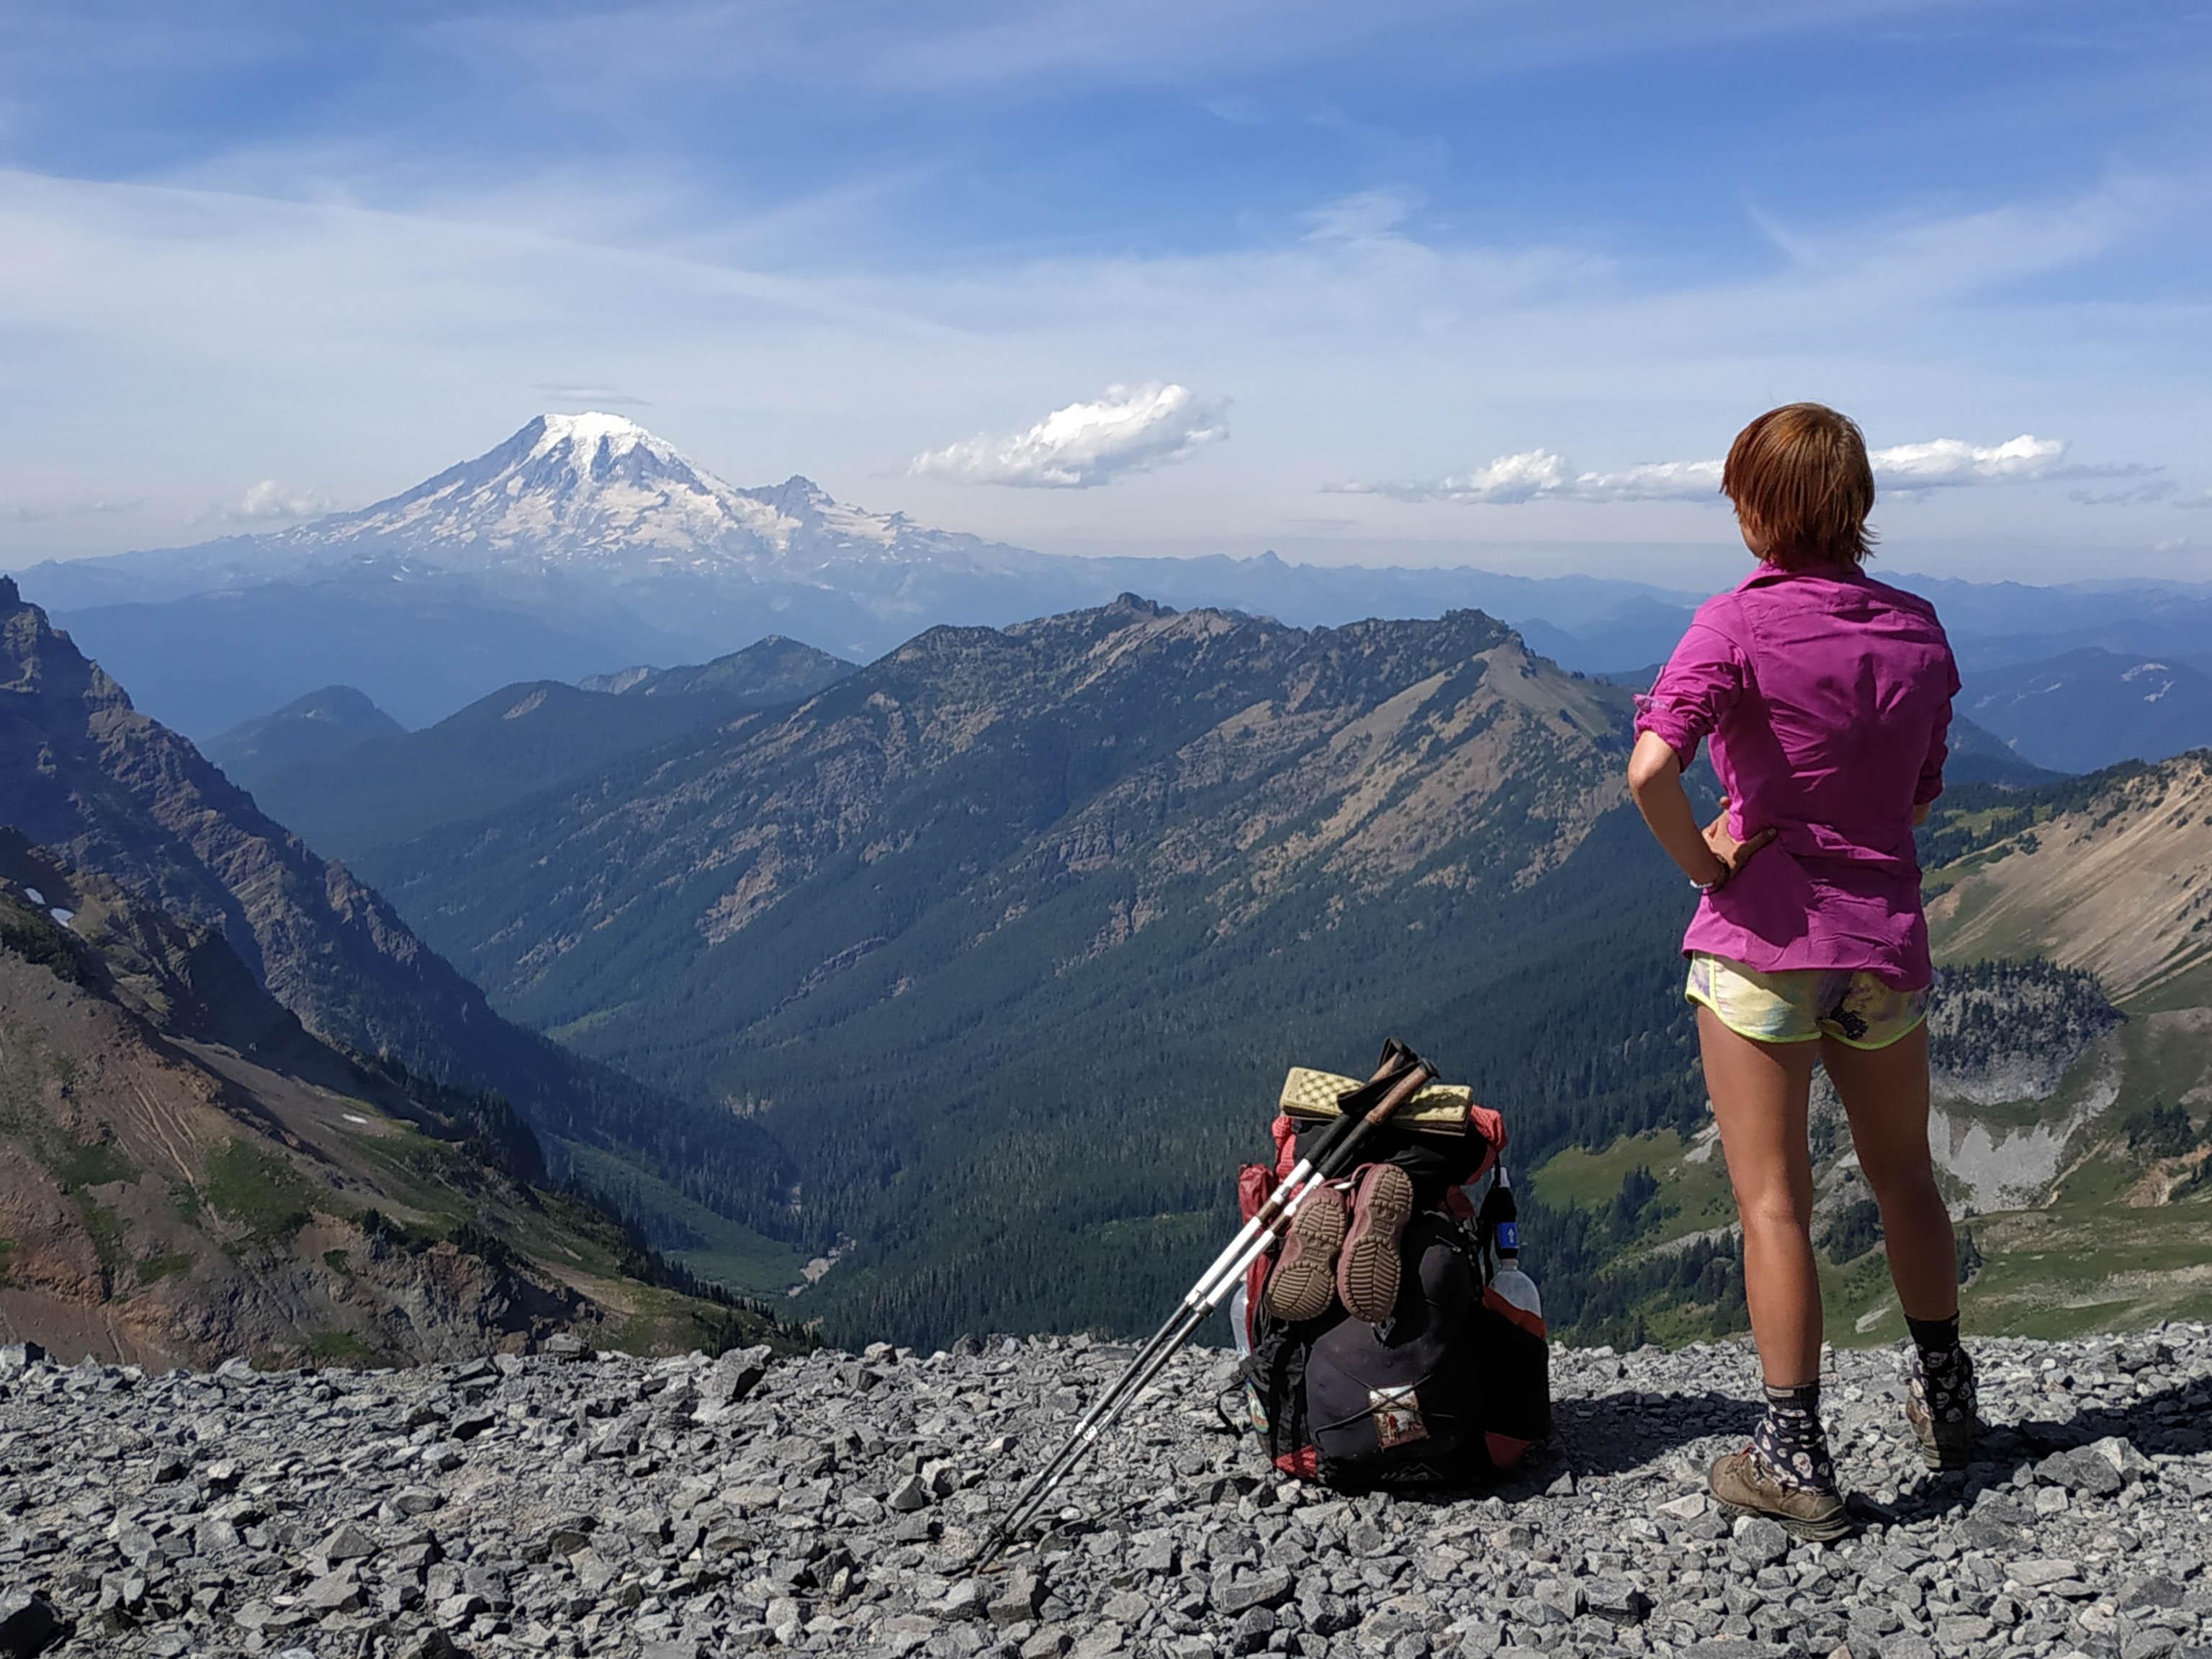 Looking at Mount Rainier